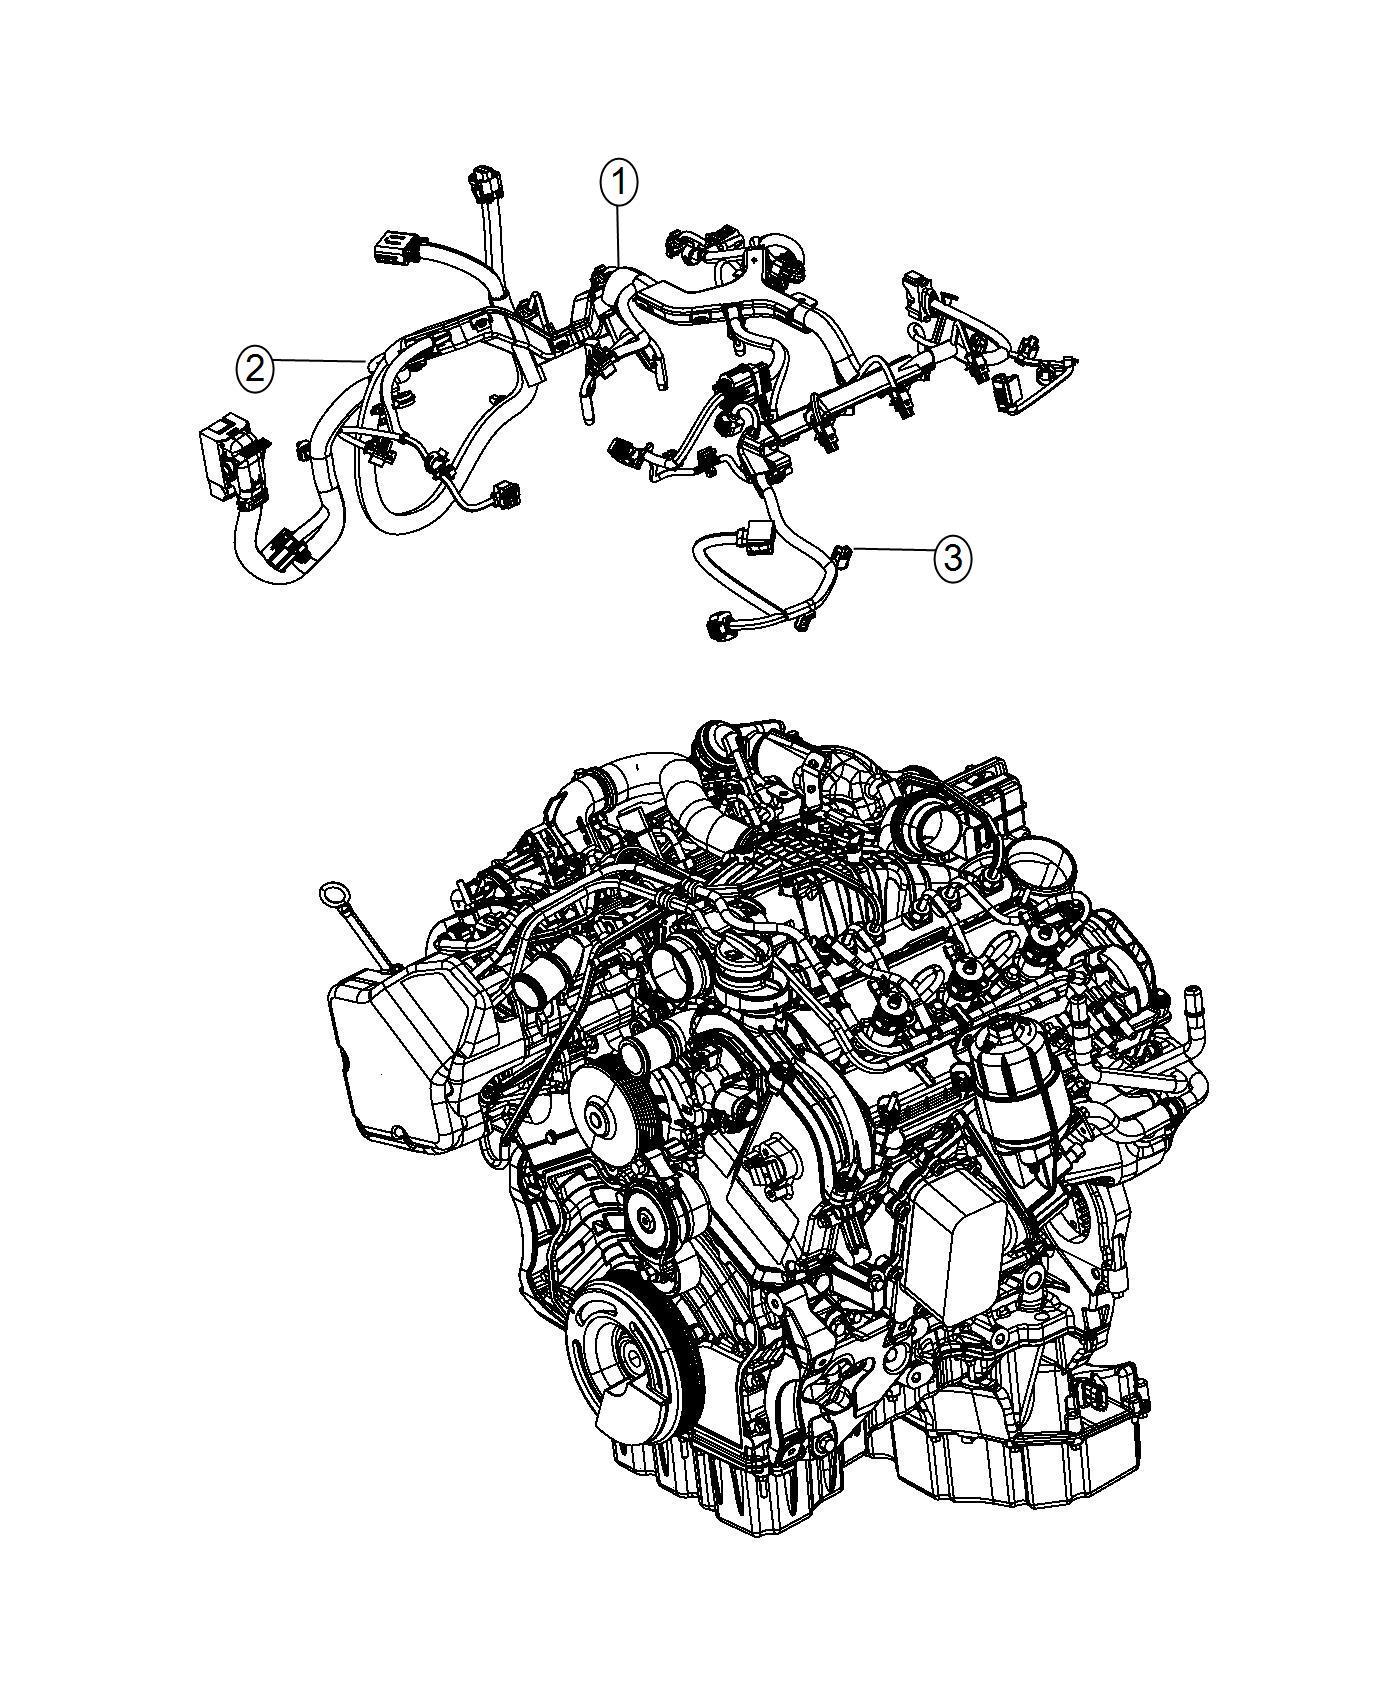 Ram 1500 Wiring  Engine  Transmission